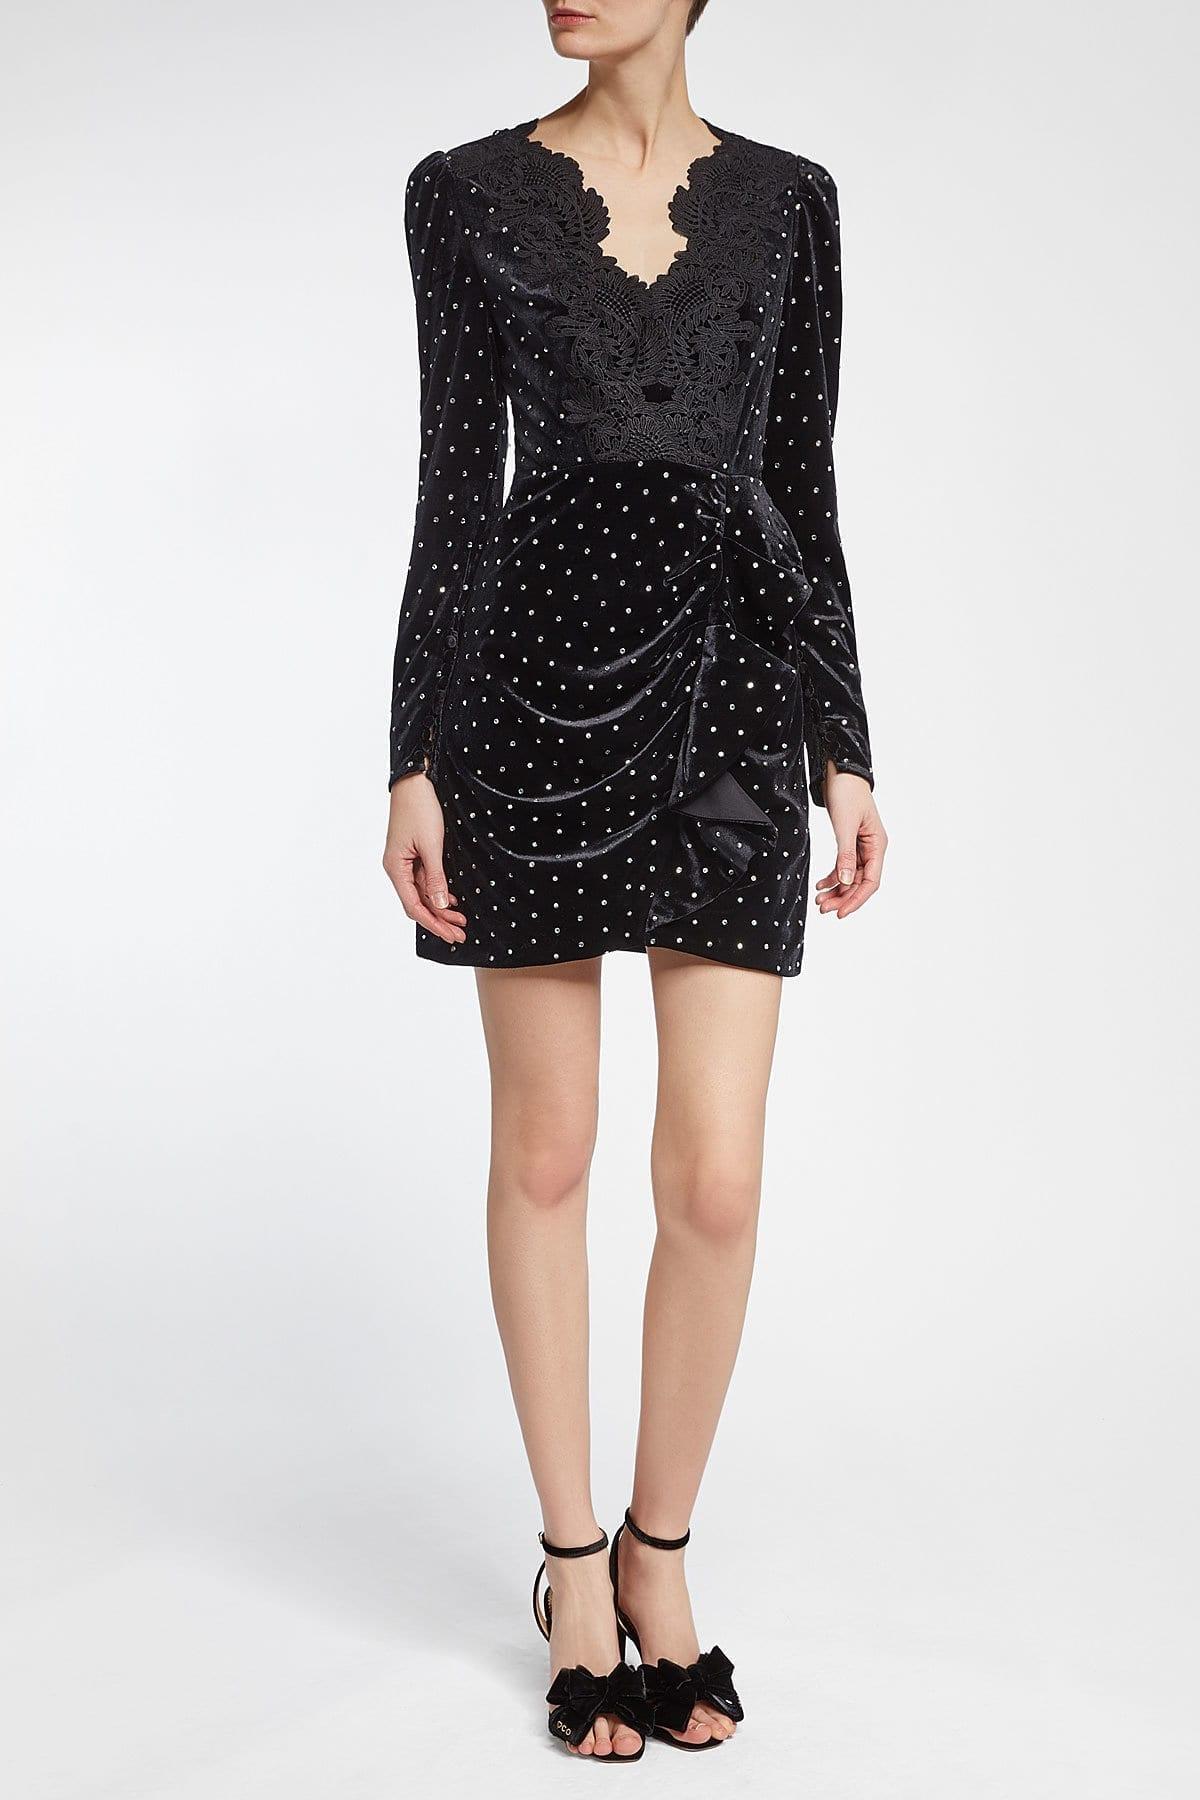 SELF-PORTRAIT Crystals and Lace Velvet Mini Black Dress